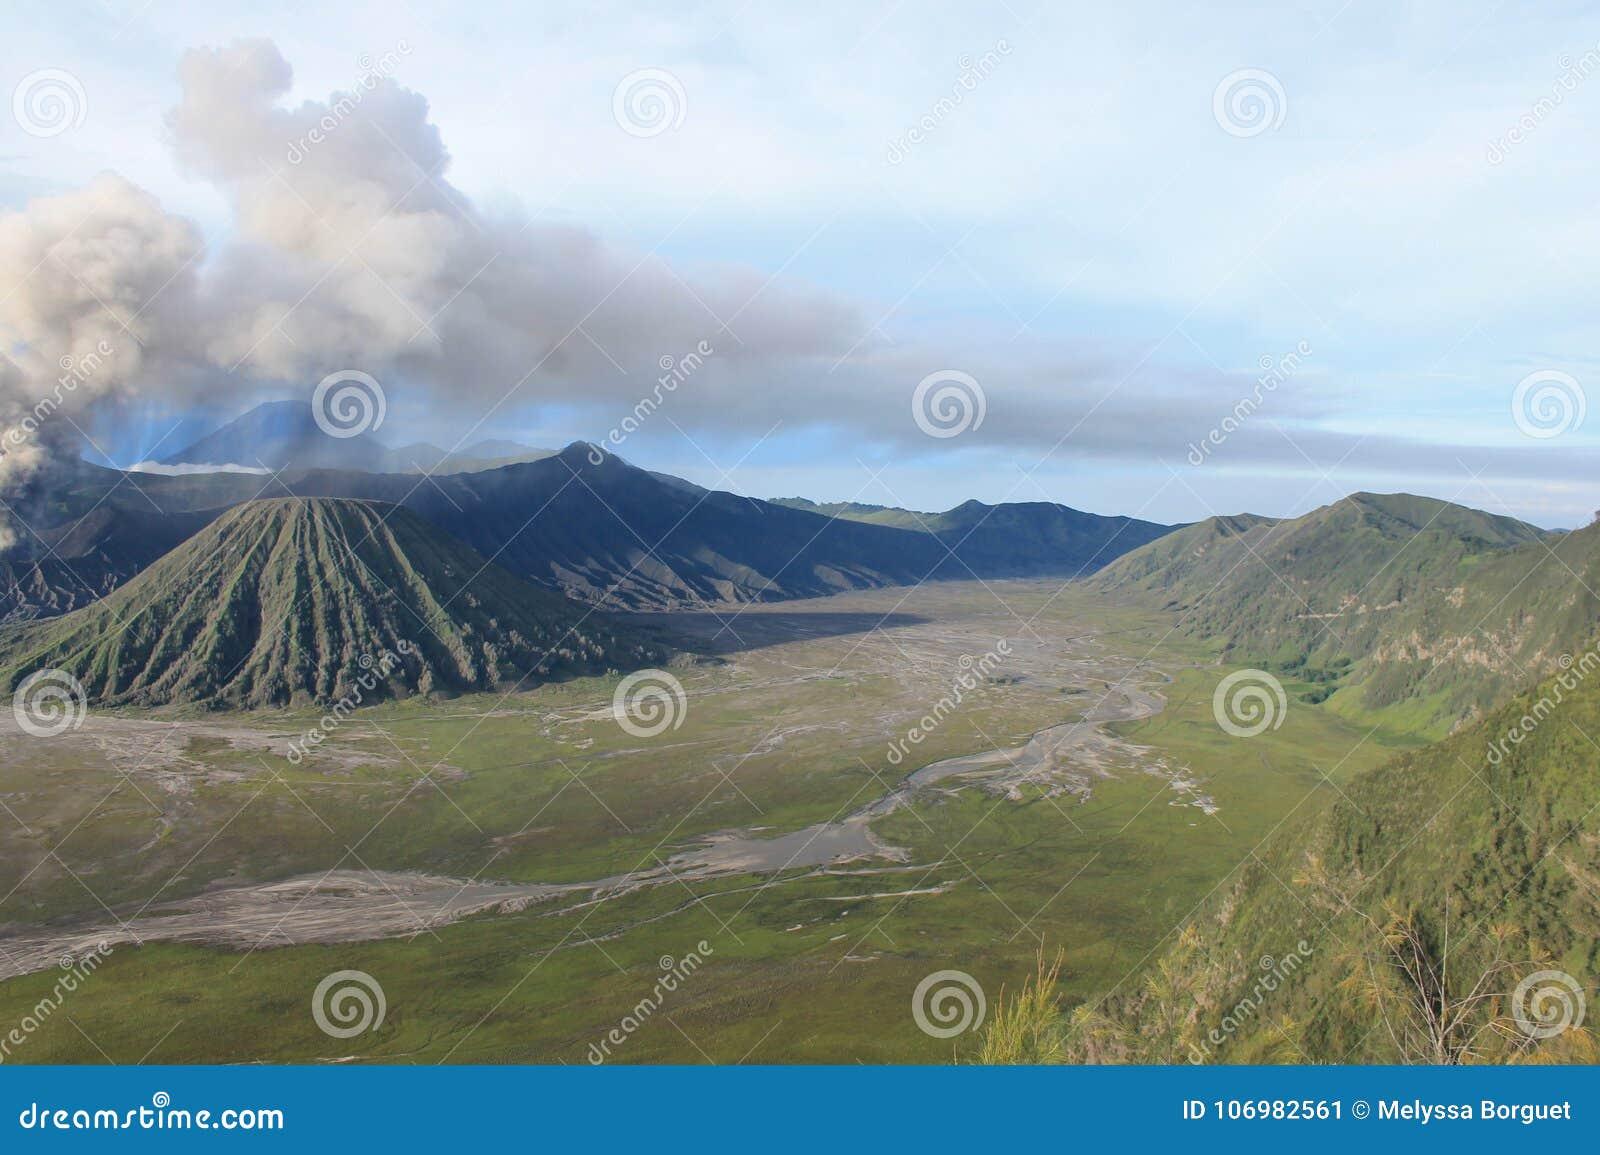 Volcano Mount Bromo Eruption, Java Indonesia